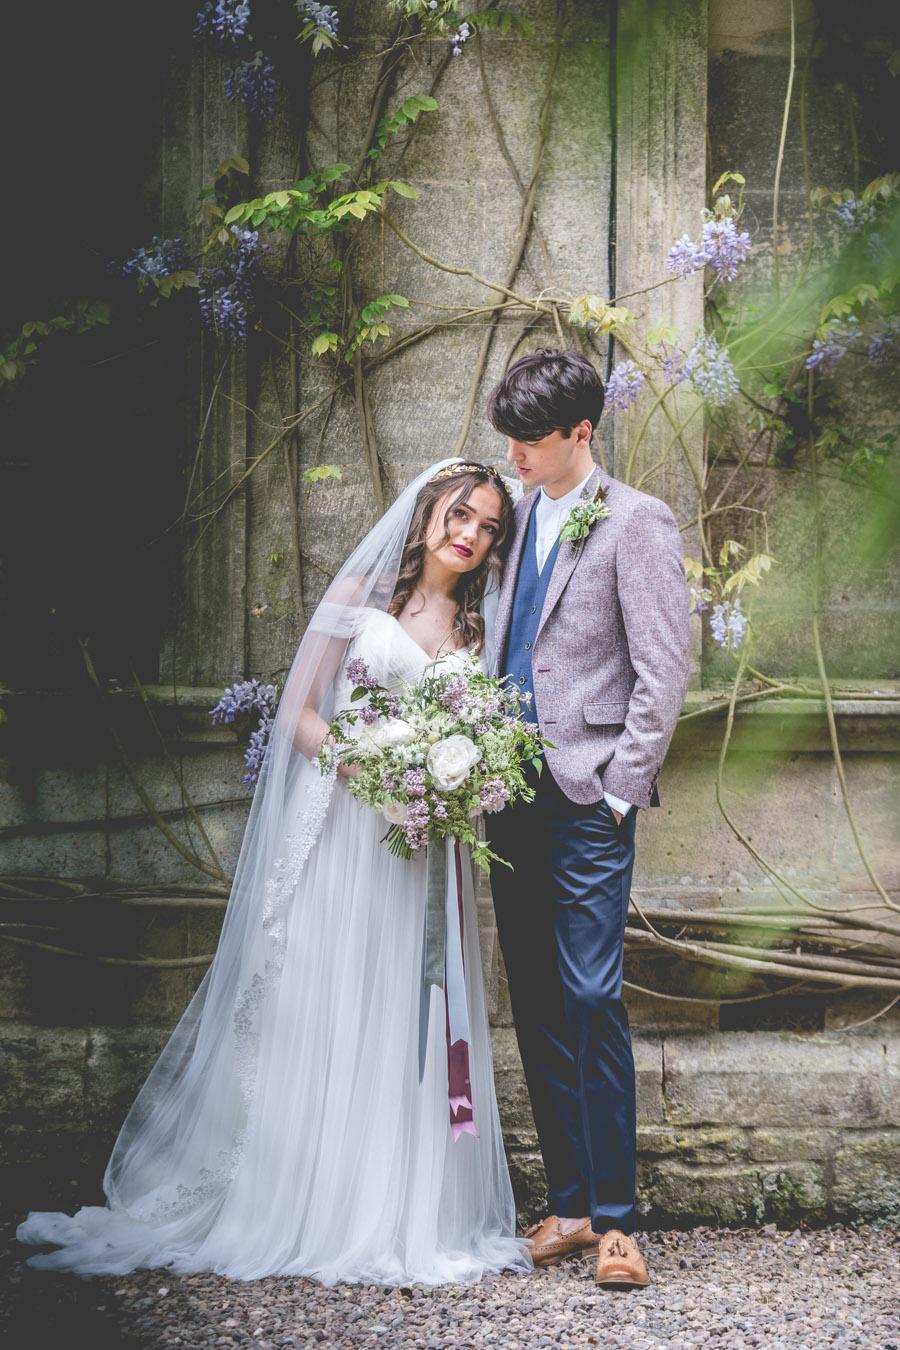 Eshott Hall wedding inspiration, credit Sean Elliott Photography (15)